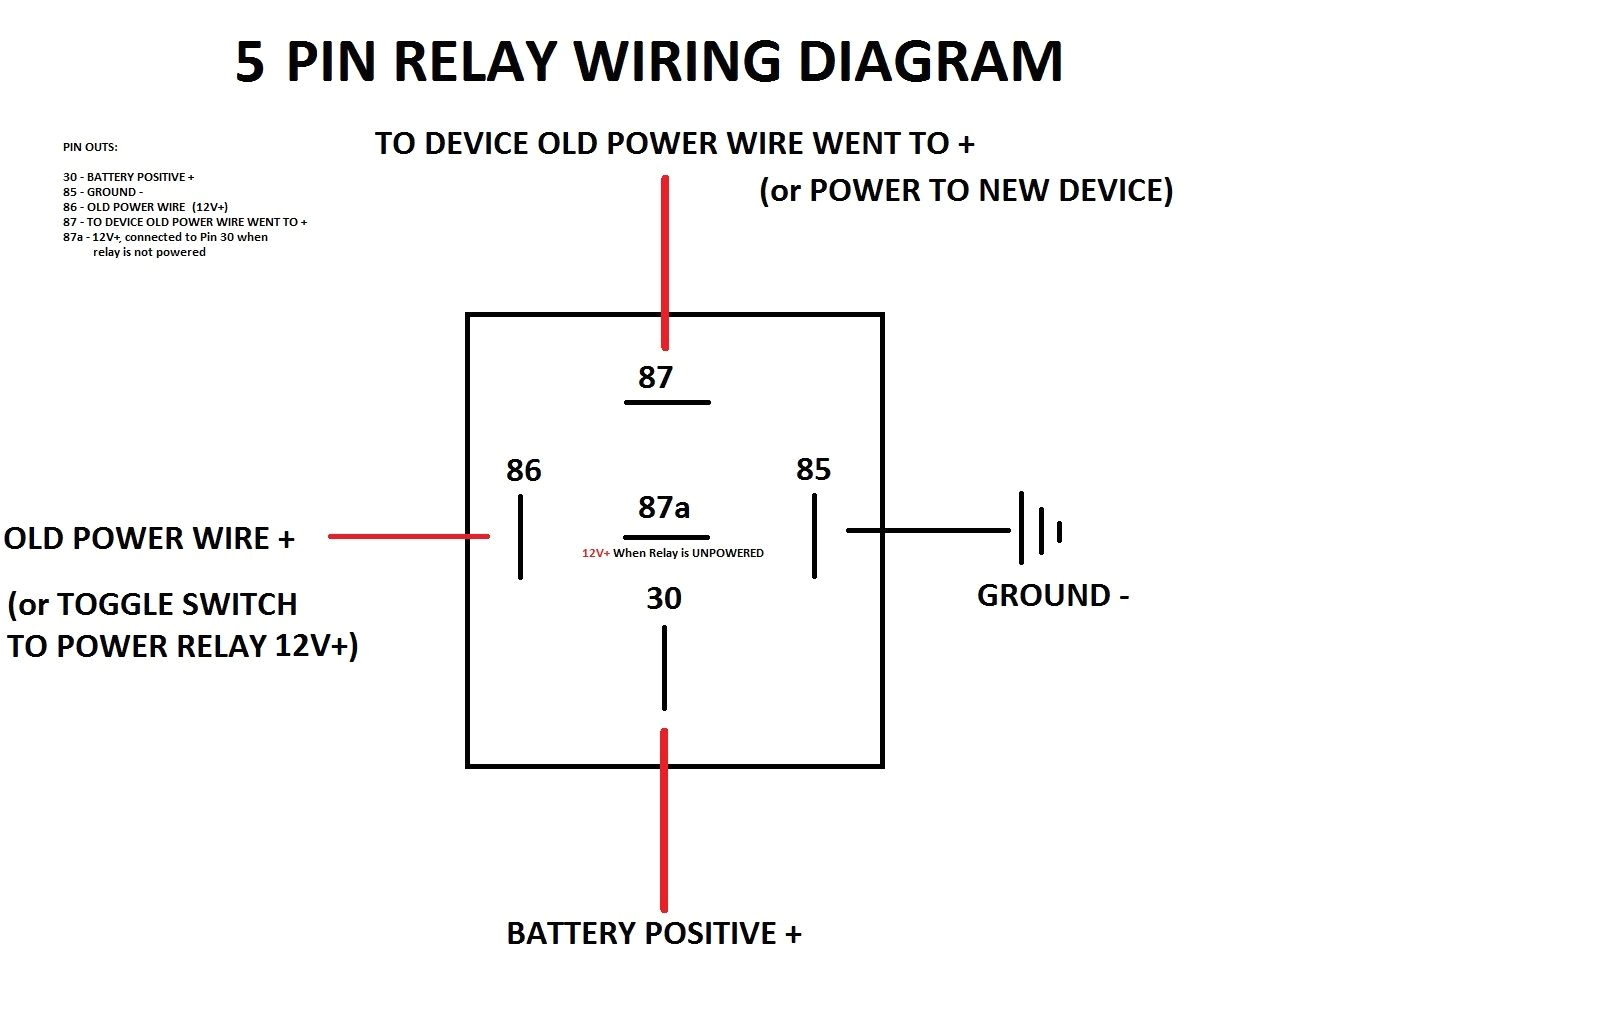 4 Pin Relay Wiring Diagram Spotlights